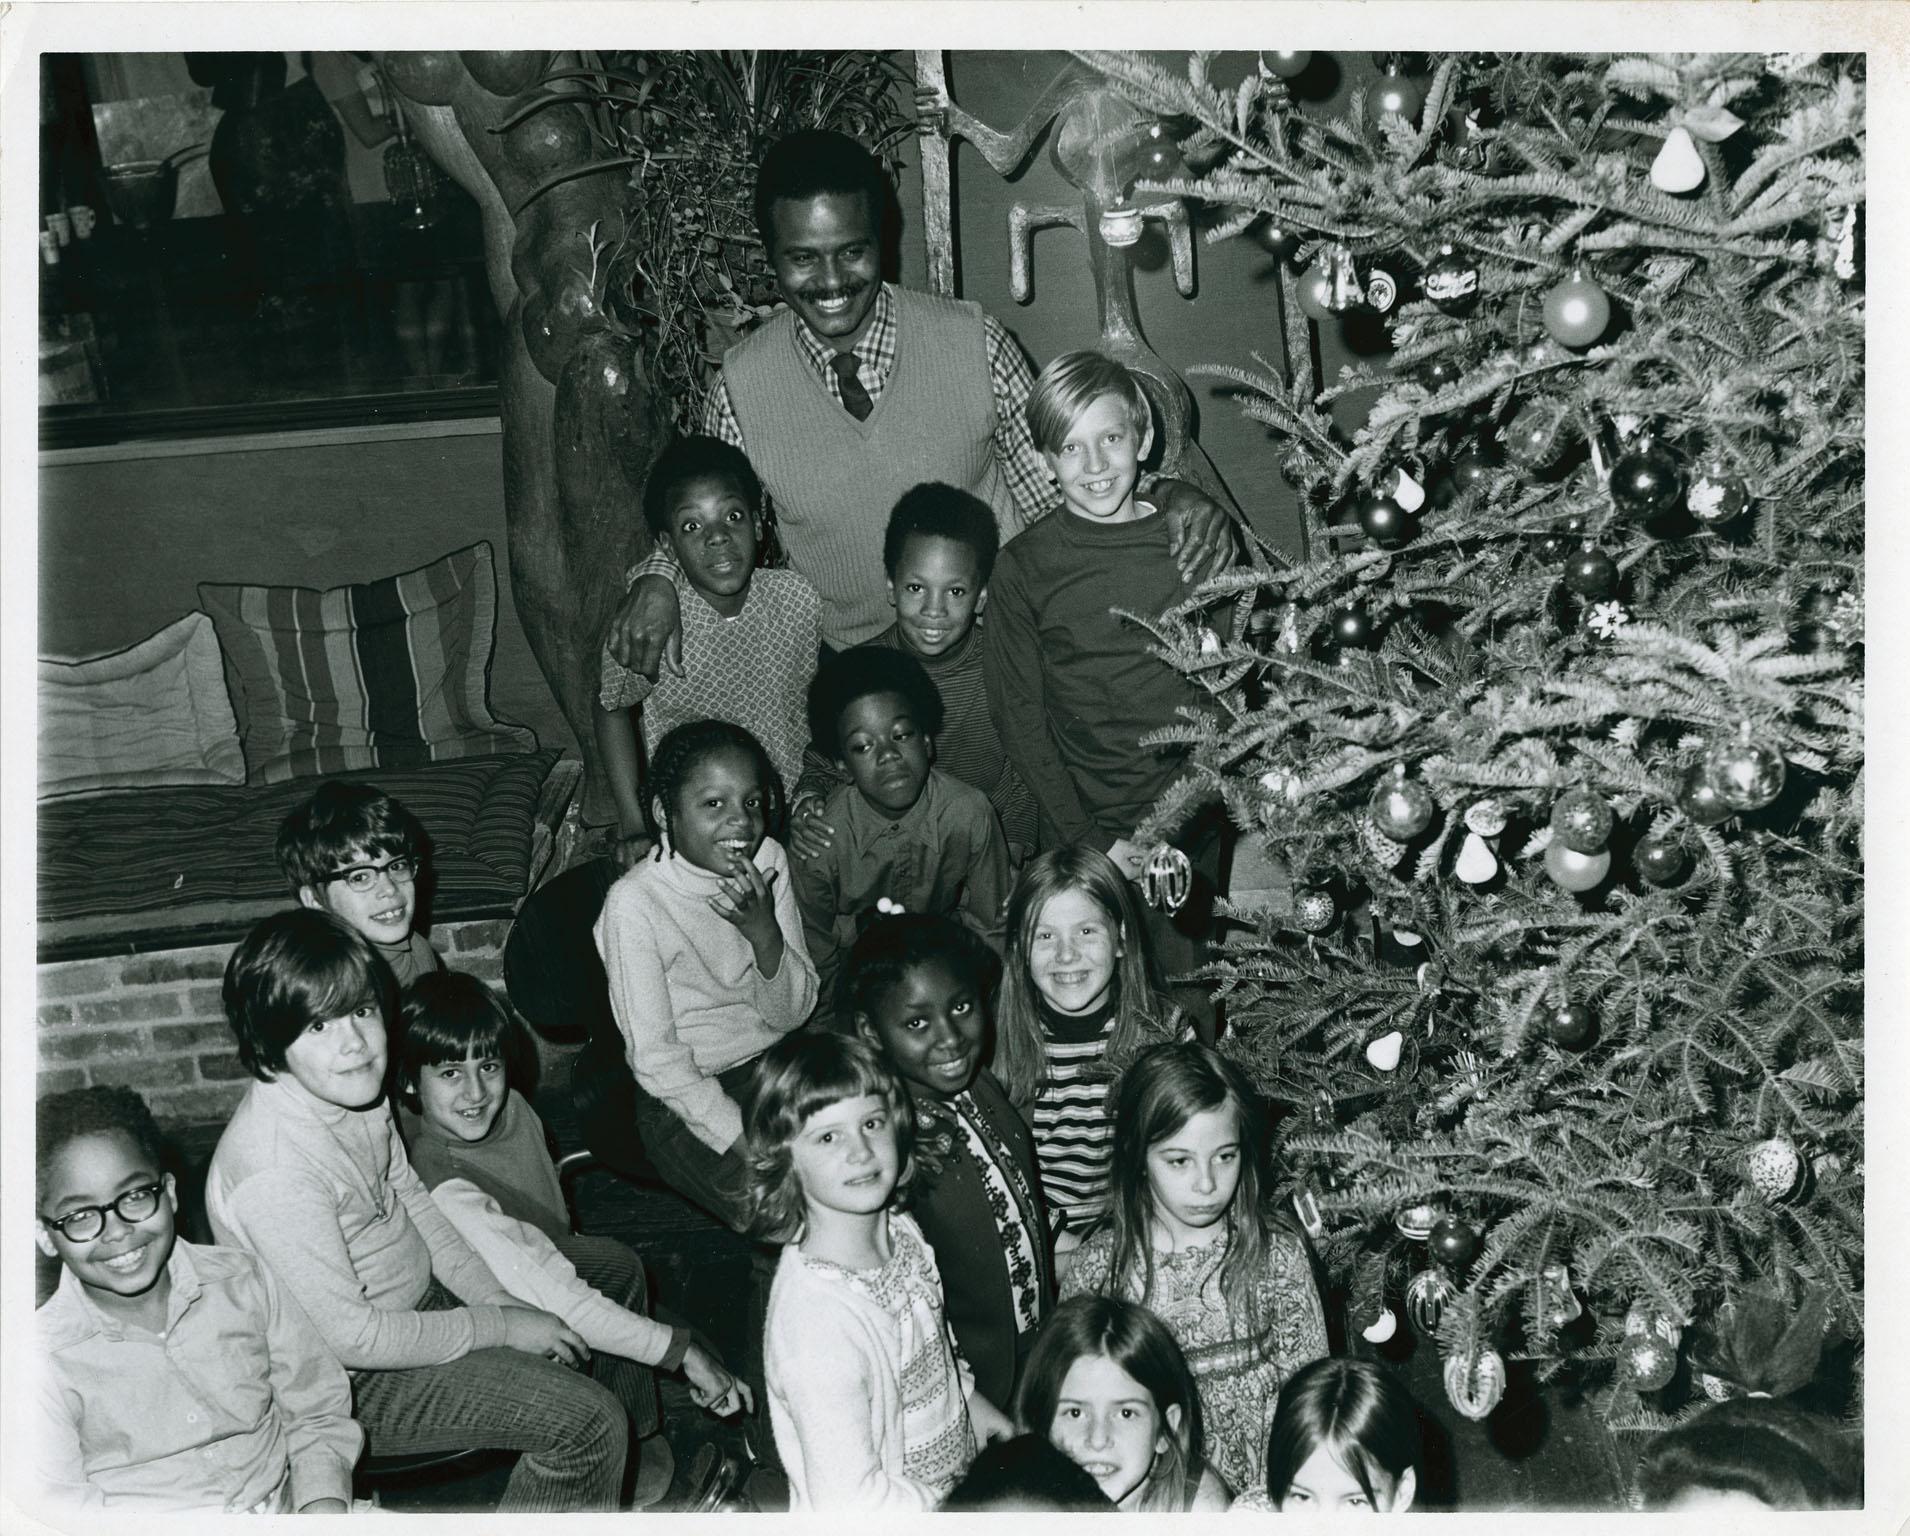 Rhoden Christmas time